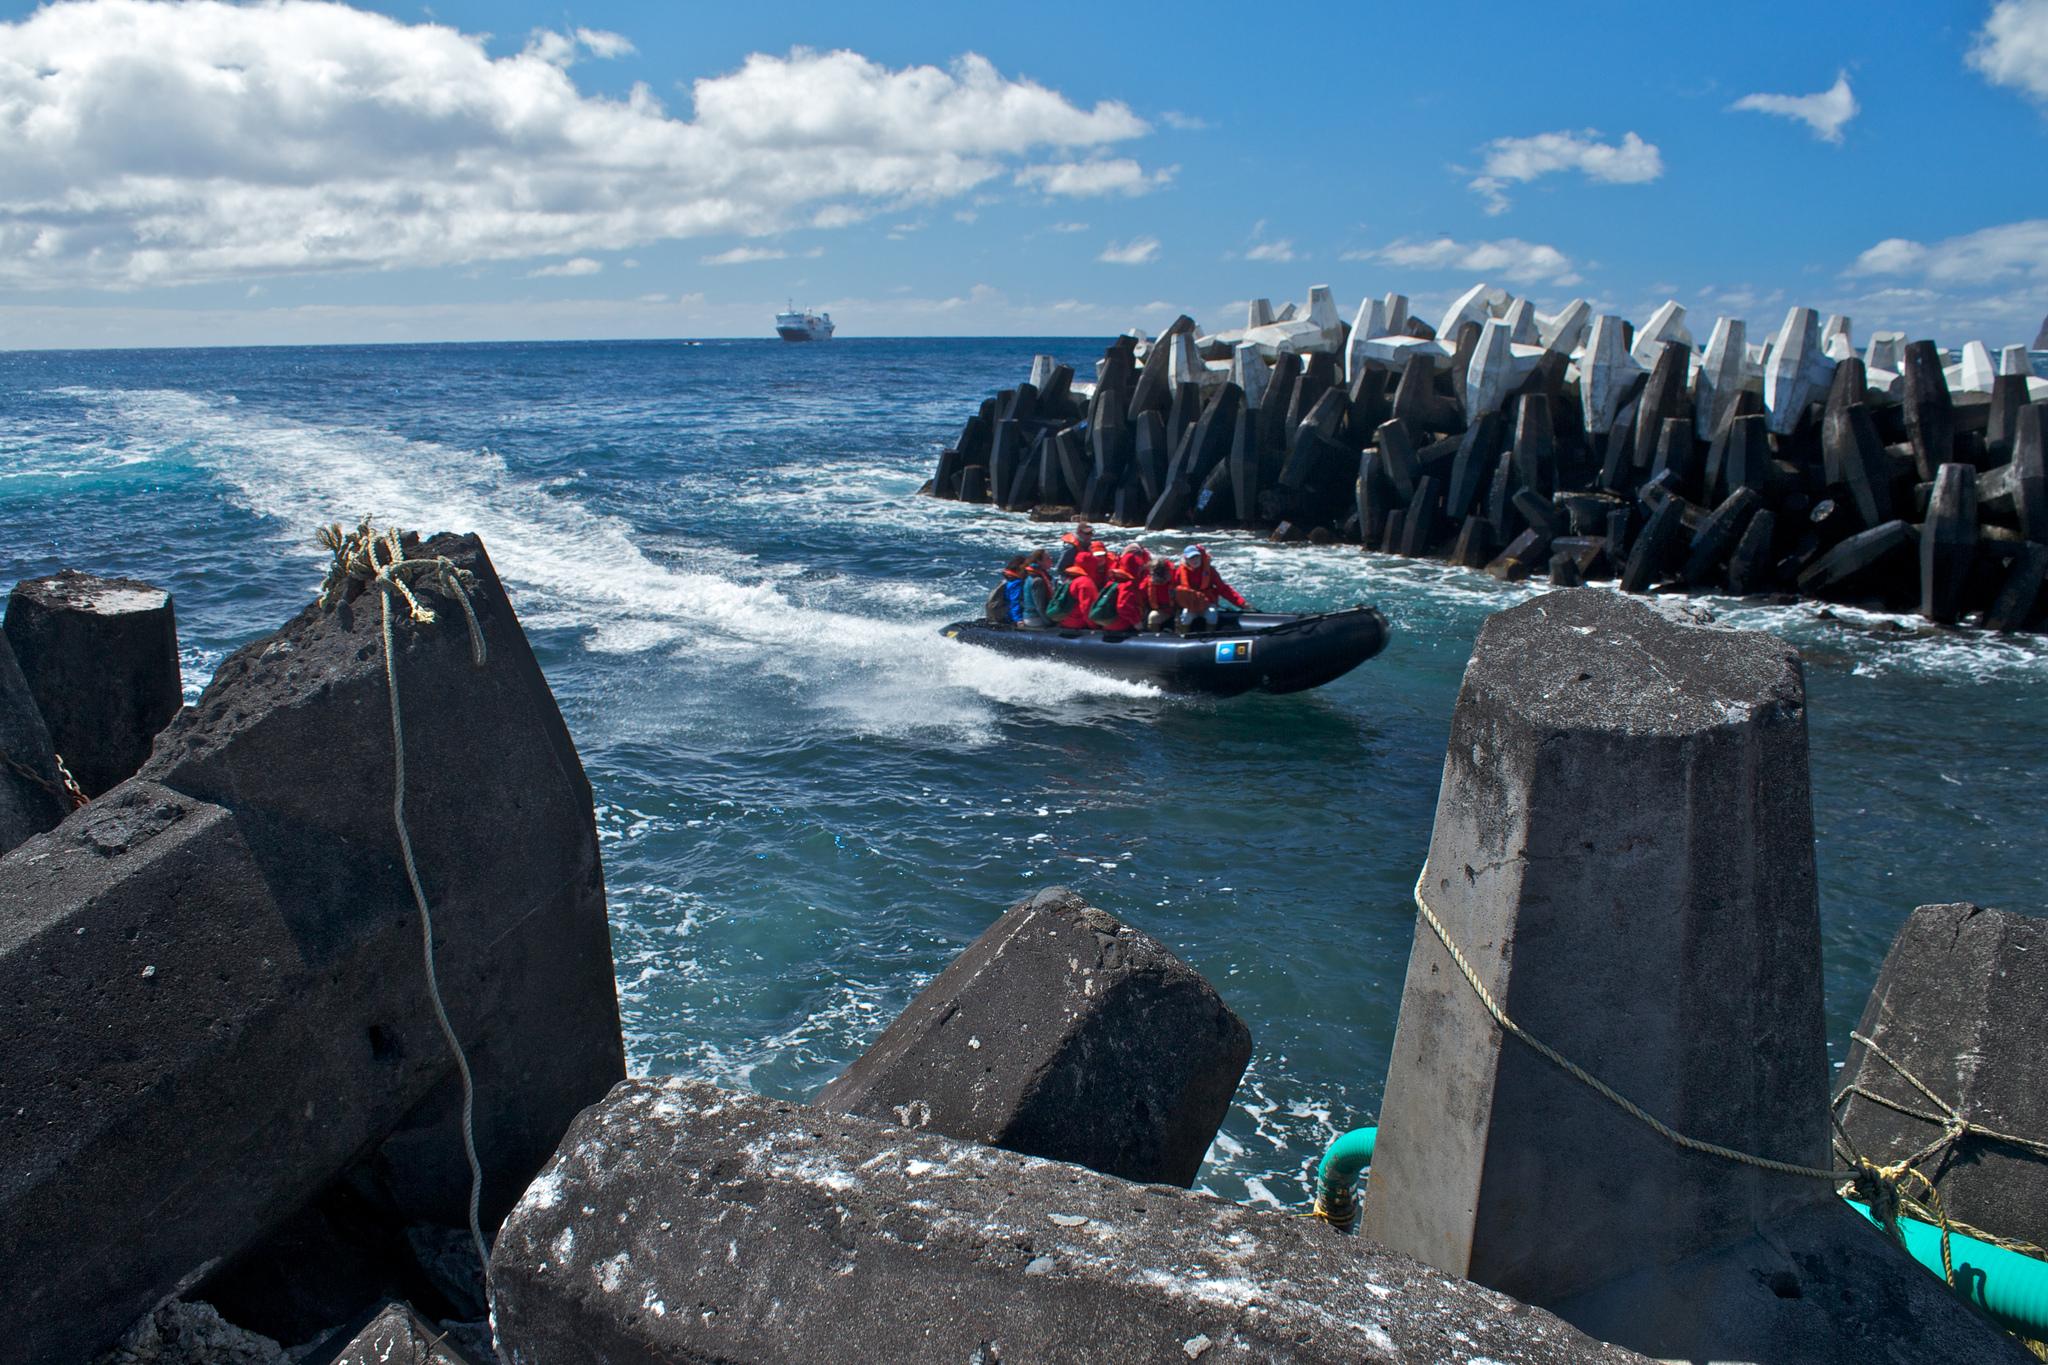 Brian Gratwicke Zodiac bringing expedition members into harbor